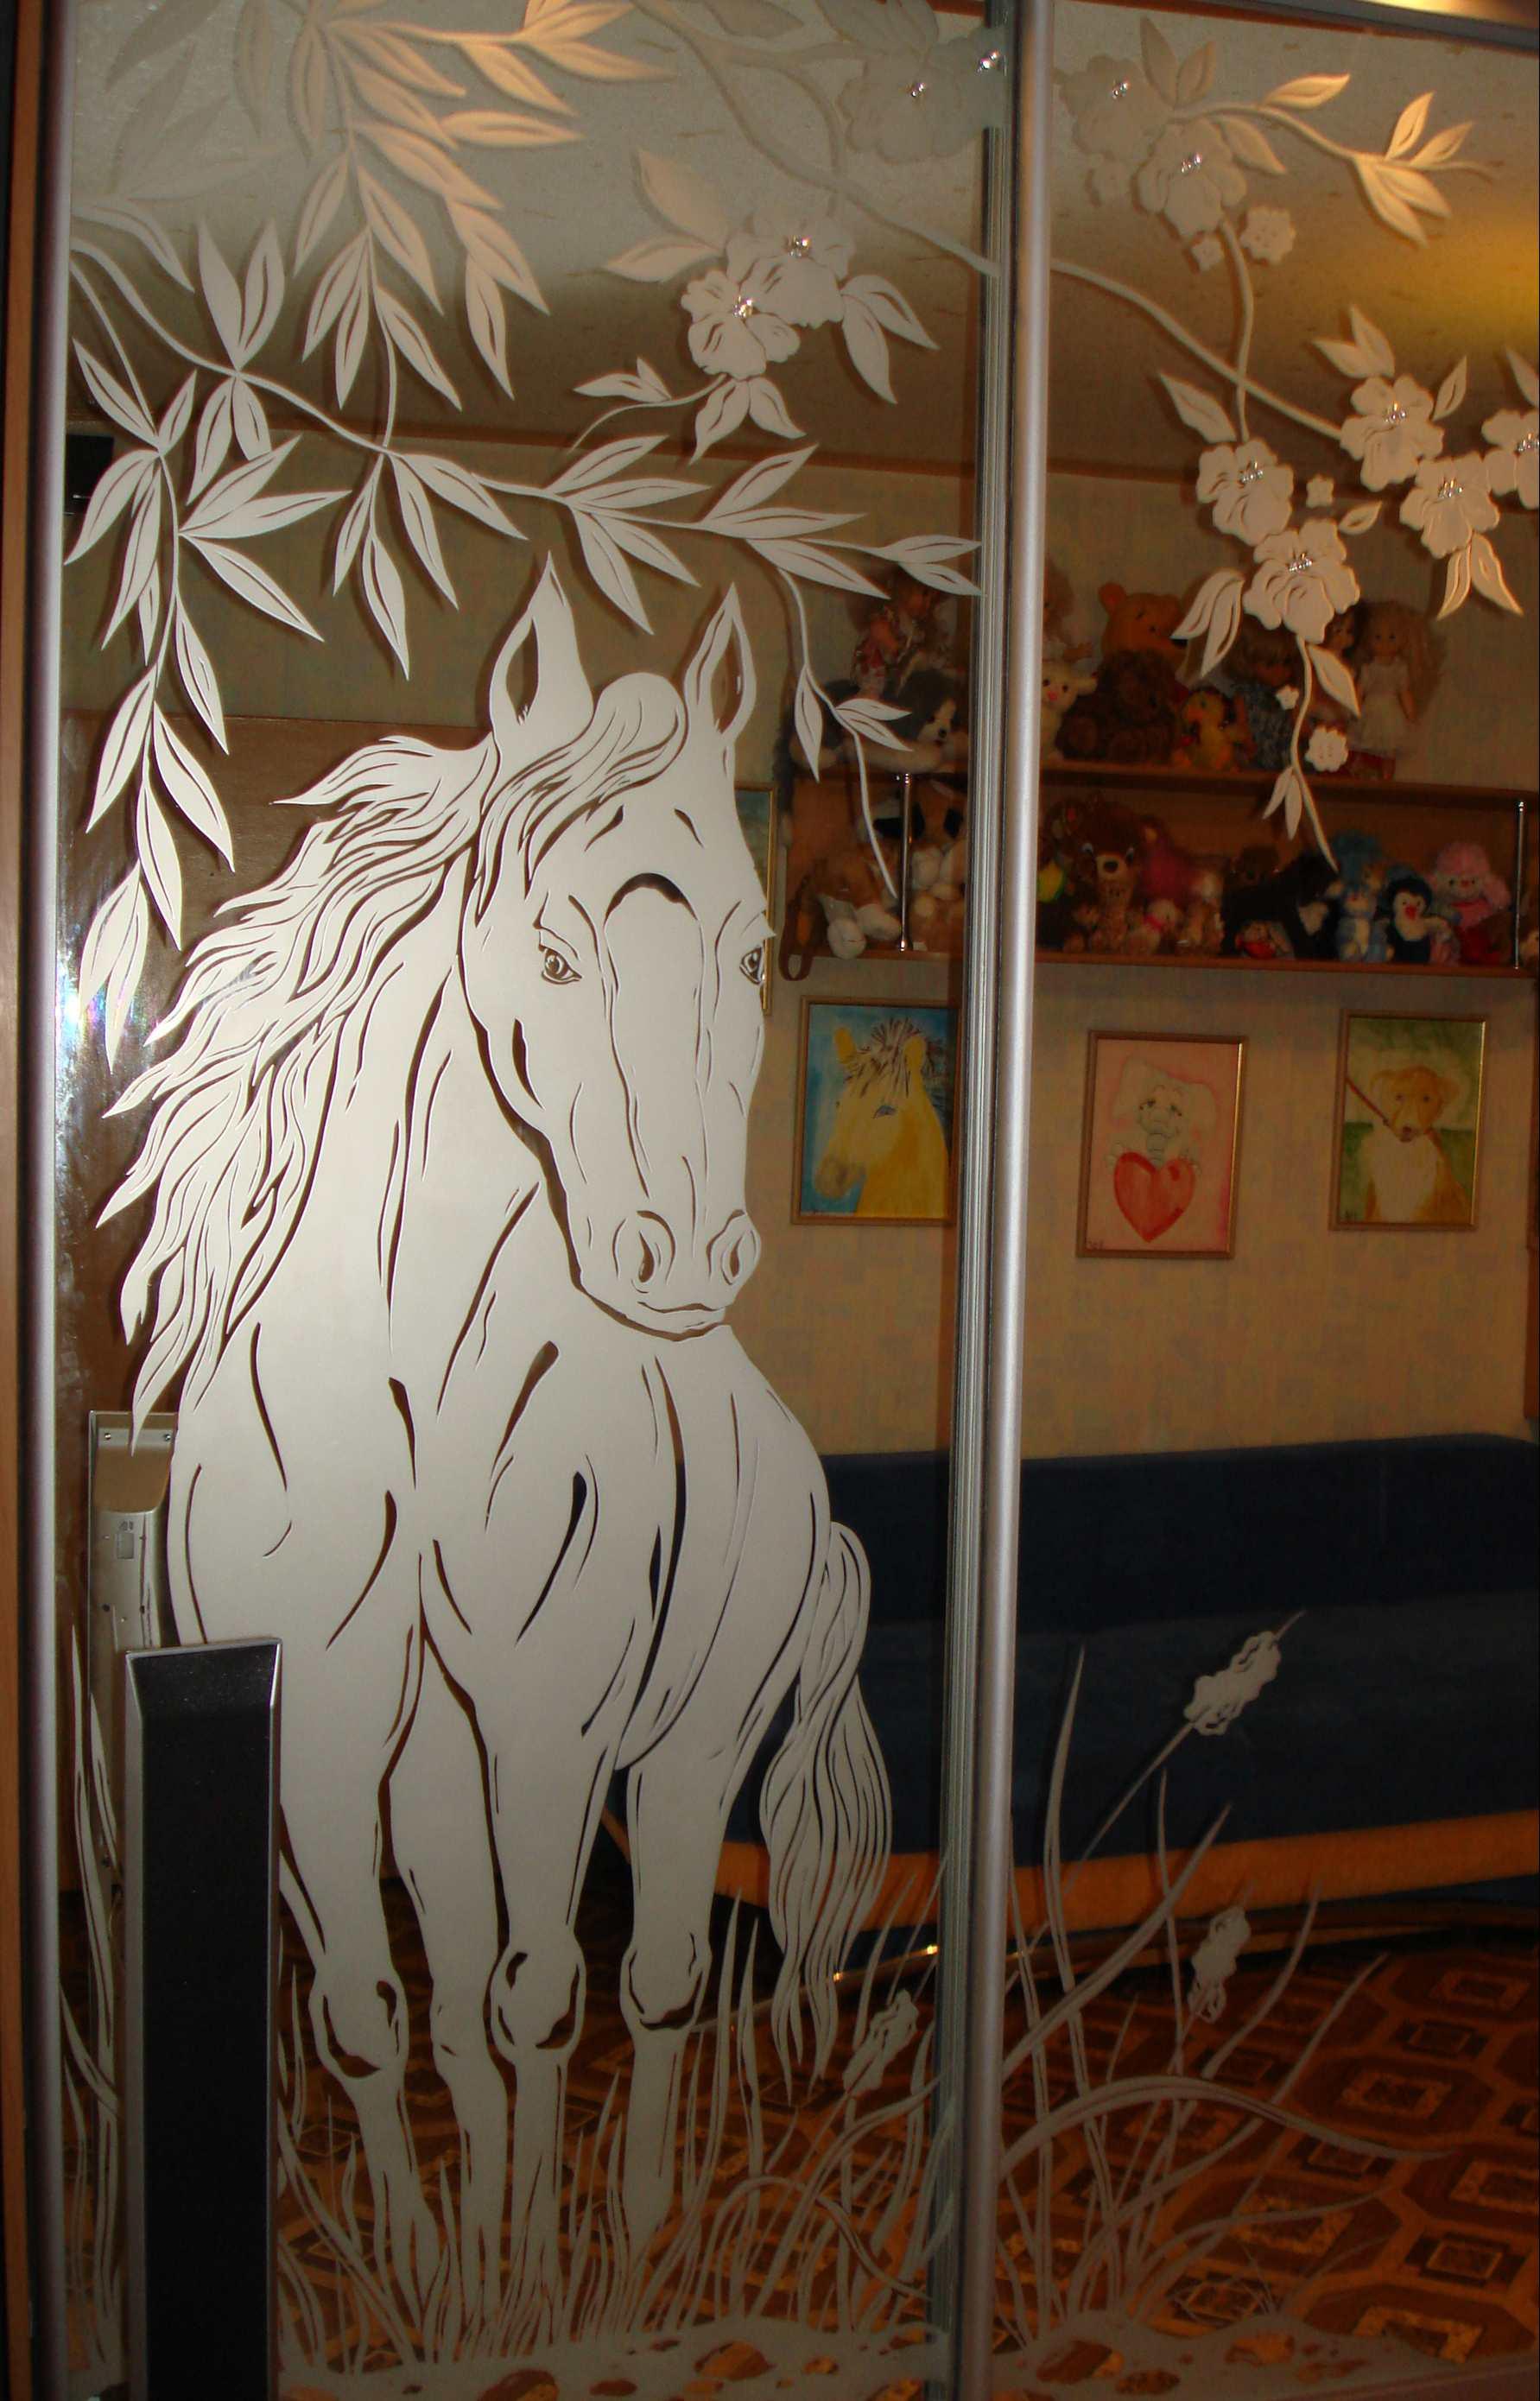 лошади на зеркале картинки для